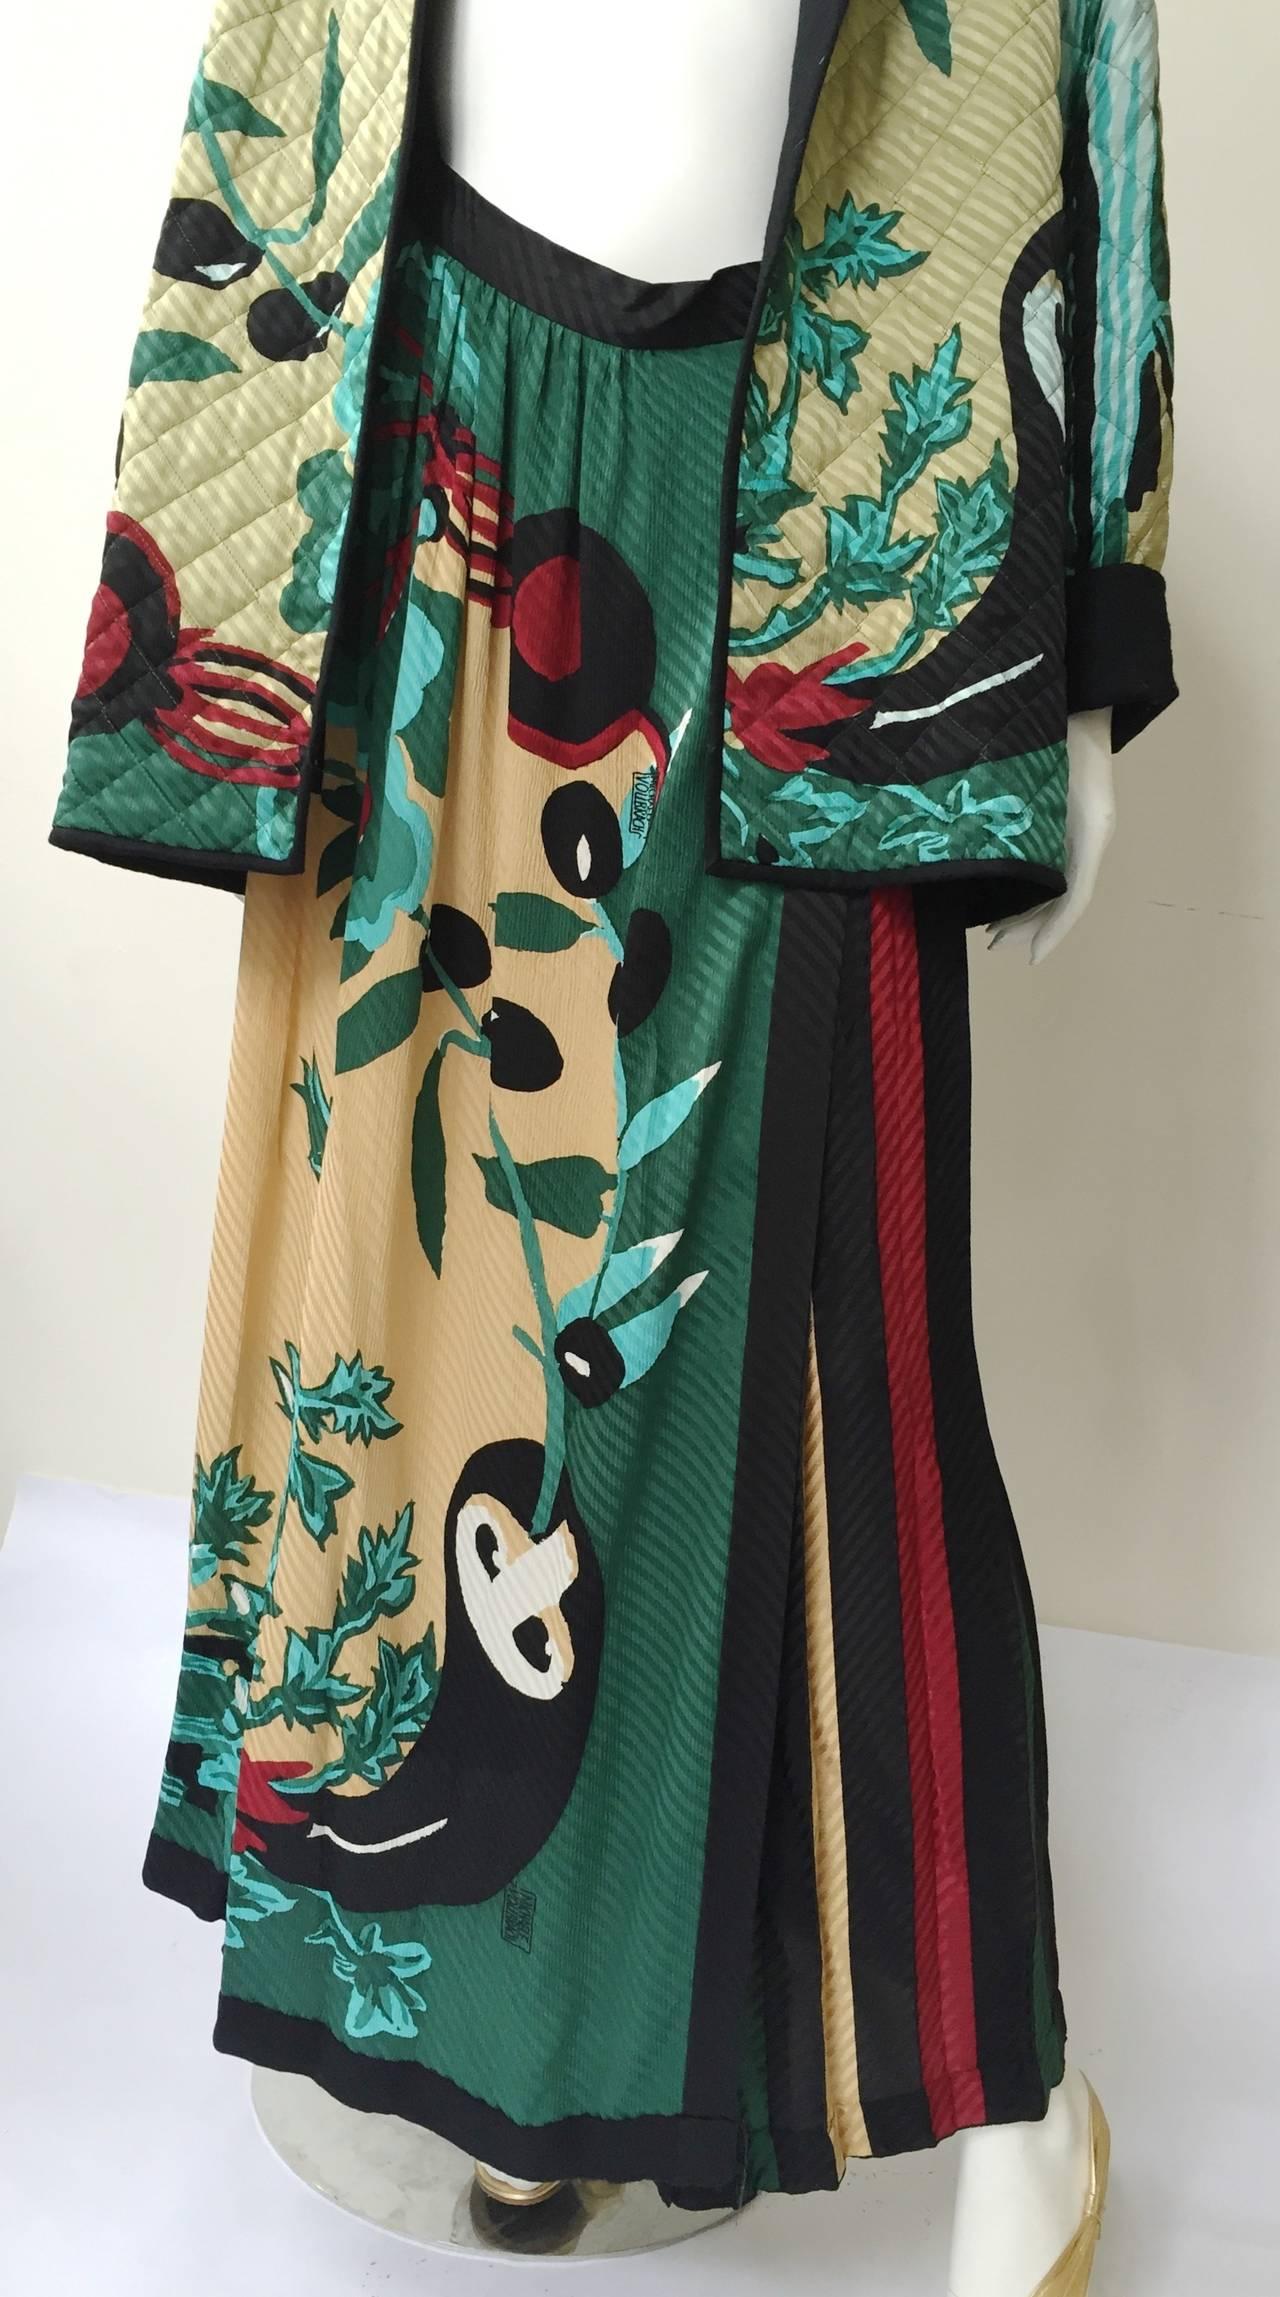 Michaele Vollbracht 80s silk quilted jacket & skirt size 6. 3